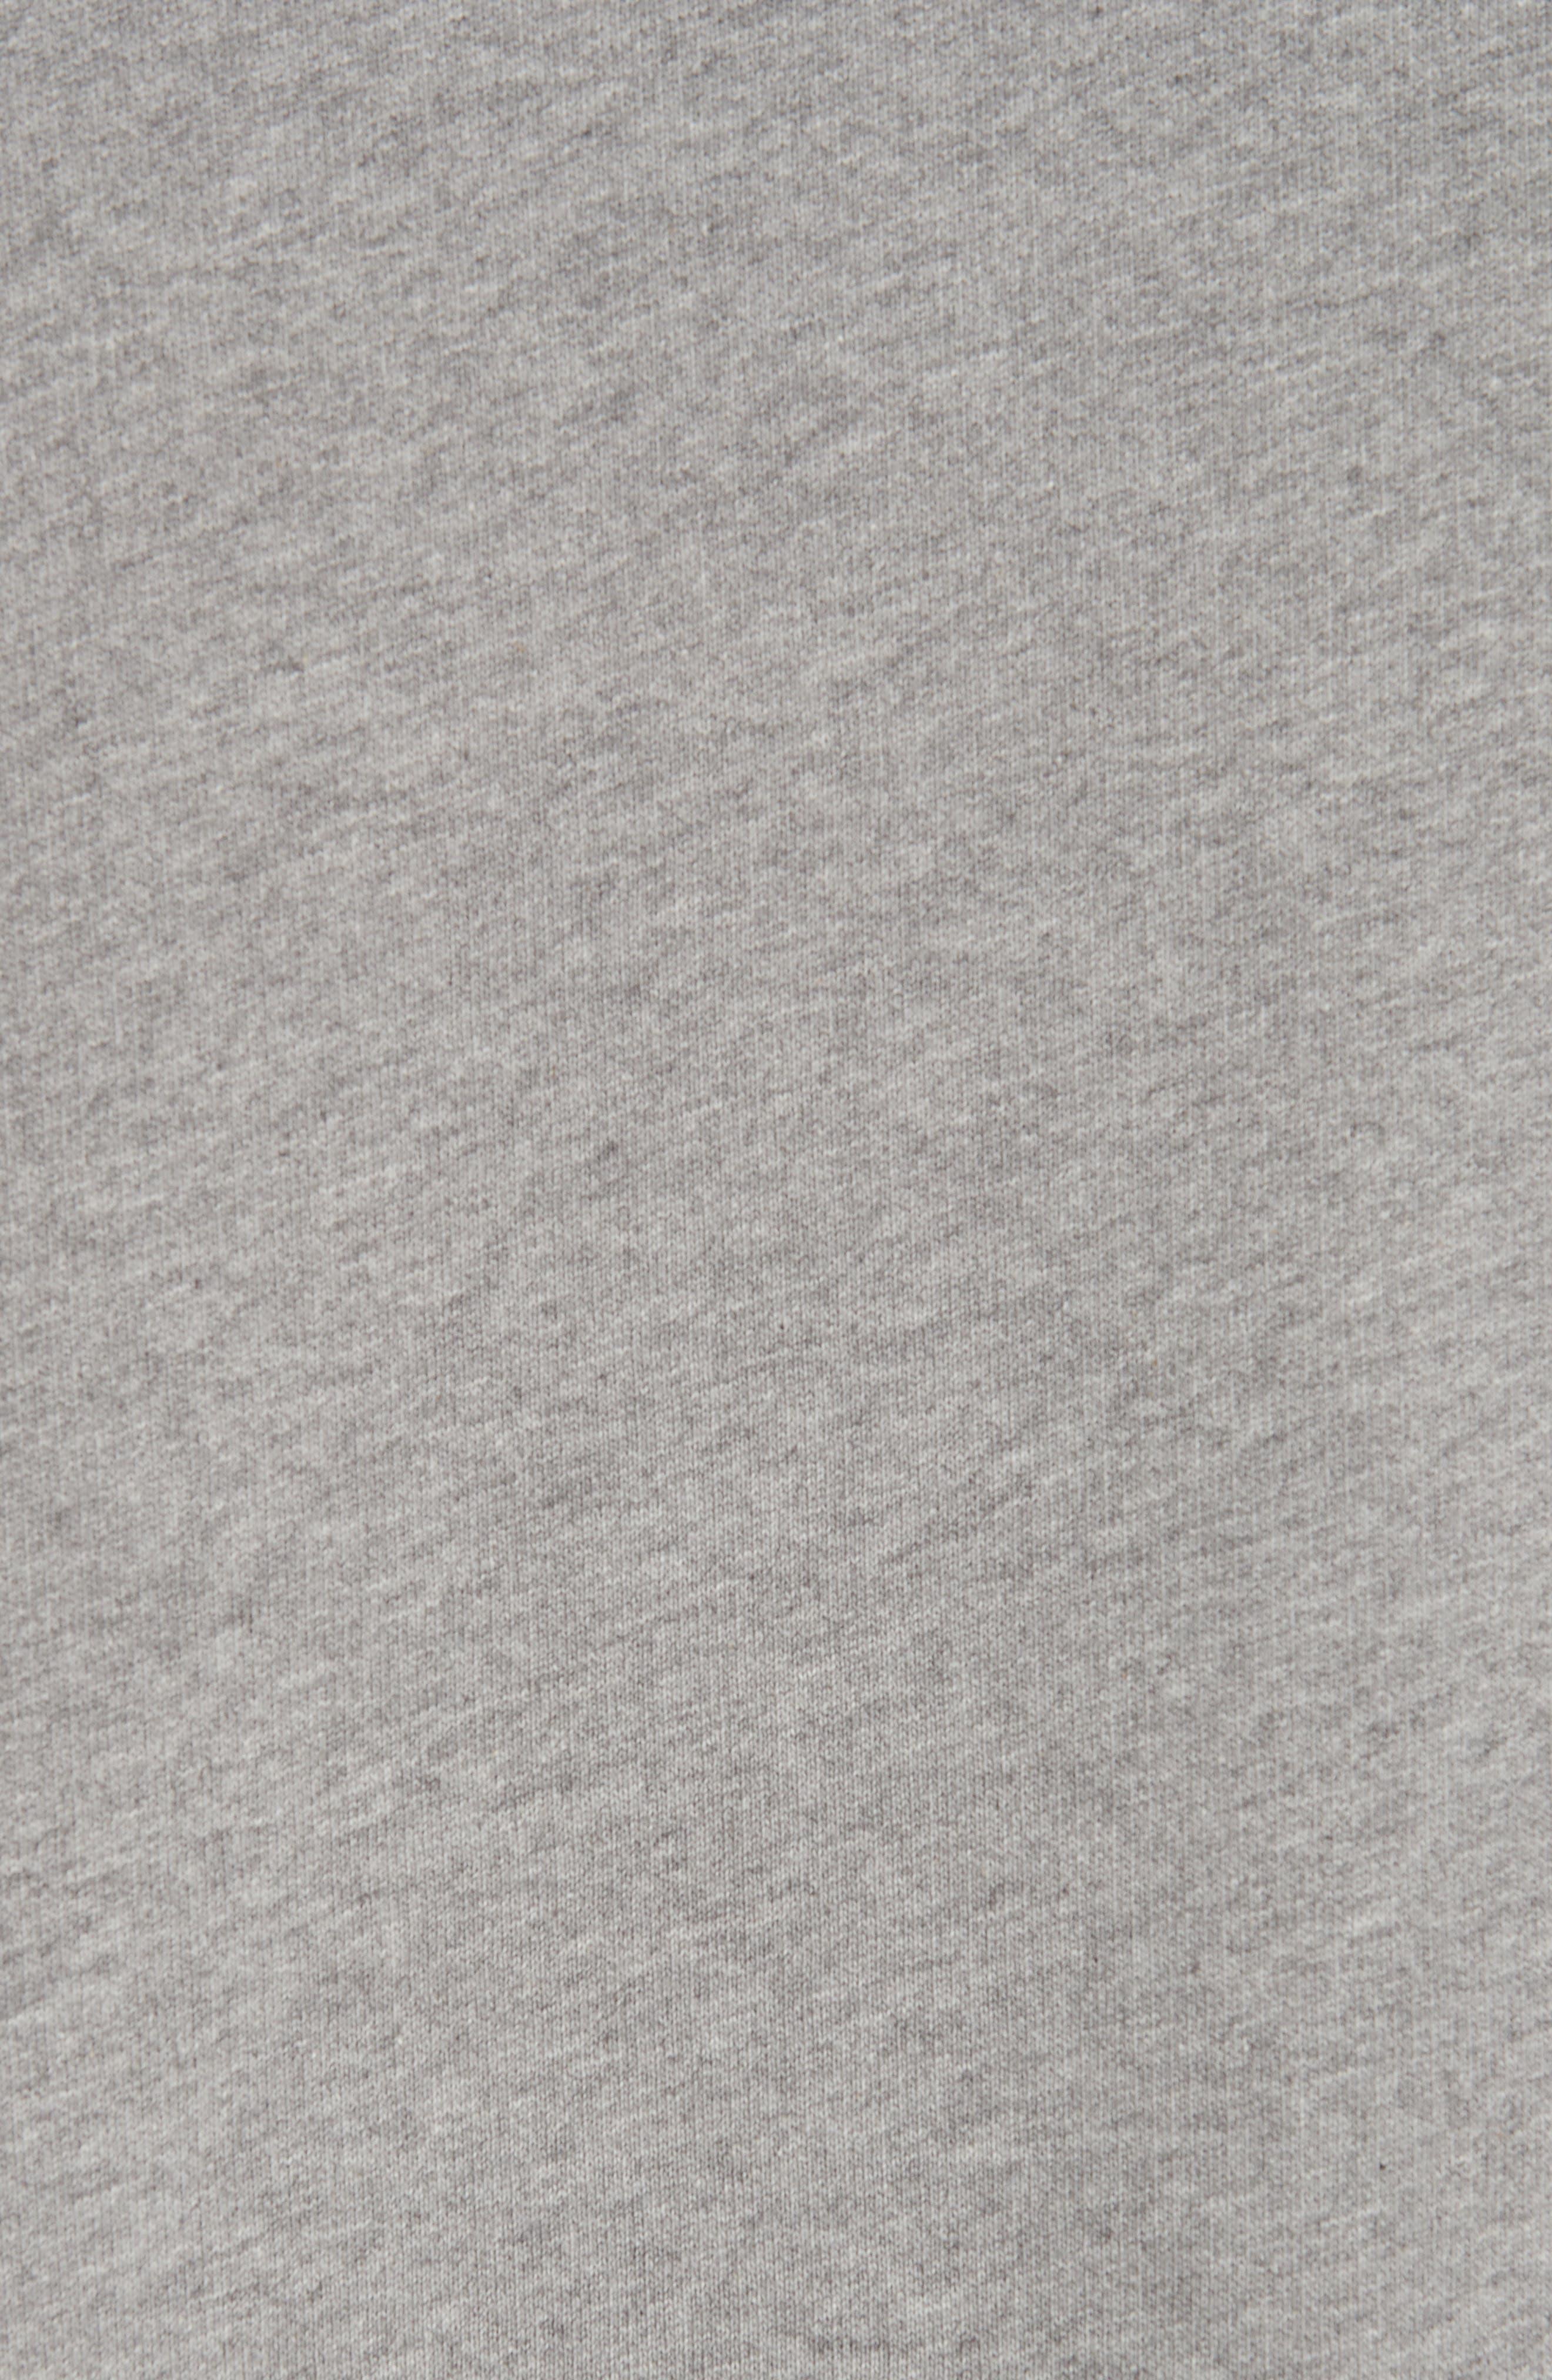 ACNE STUDIOS, Forba Face Sweatshirt, Alternate thumbnail 5, color, LIGHT GREY MELANGE